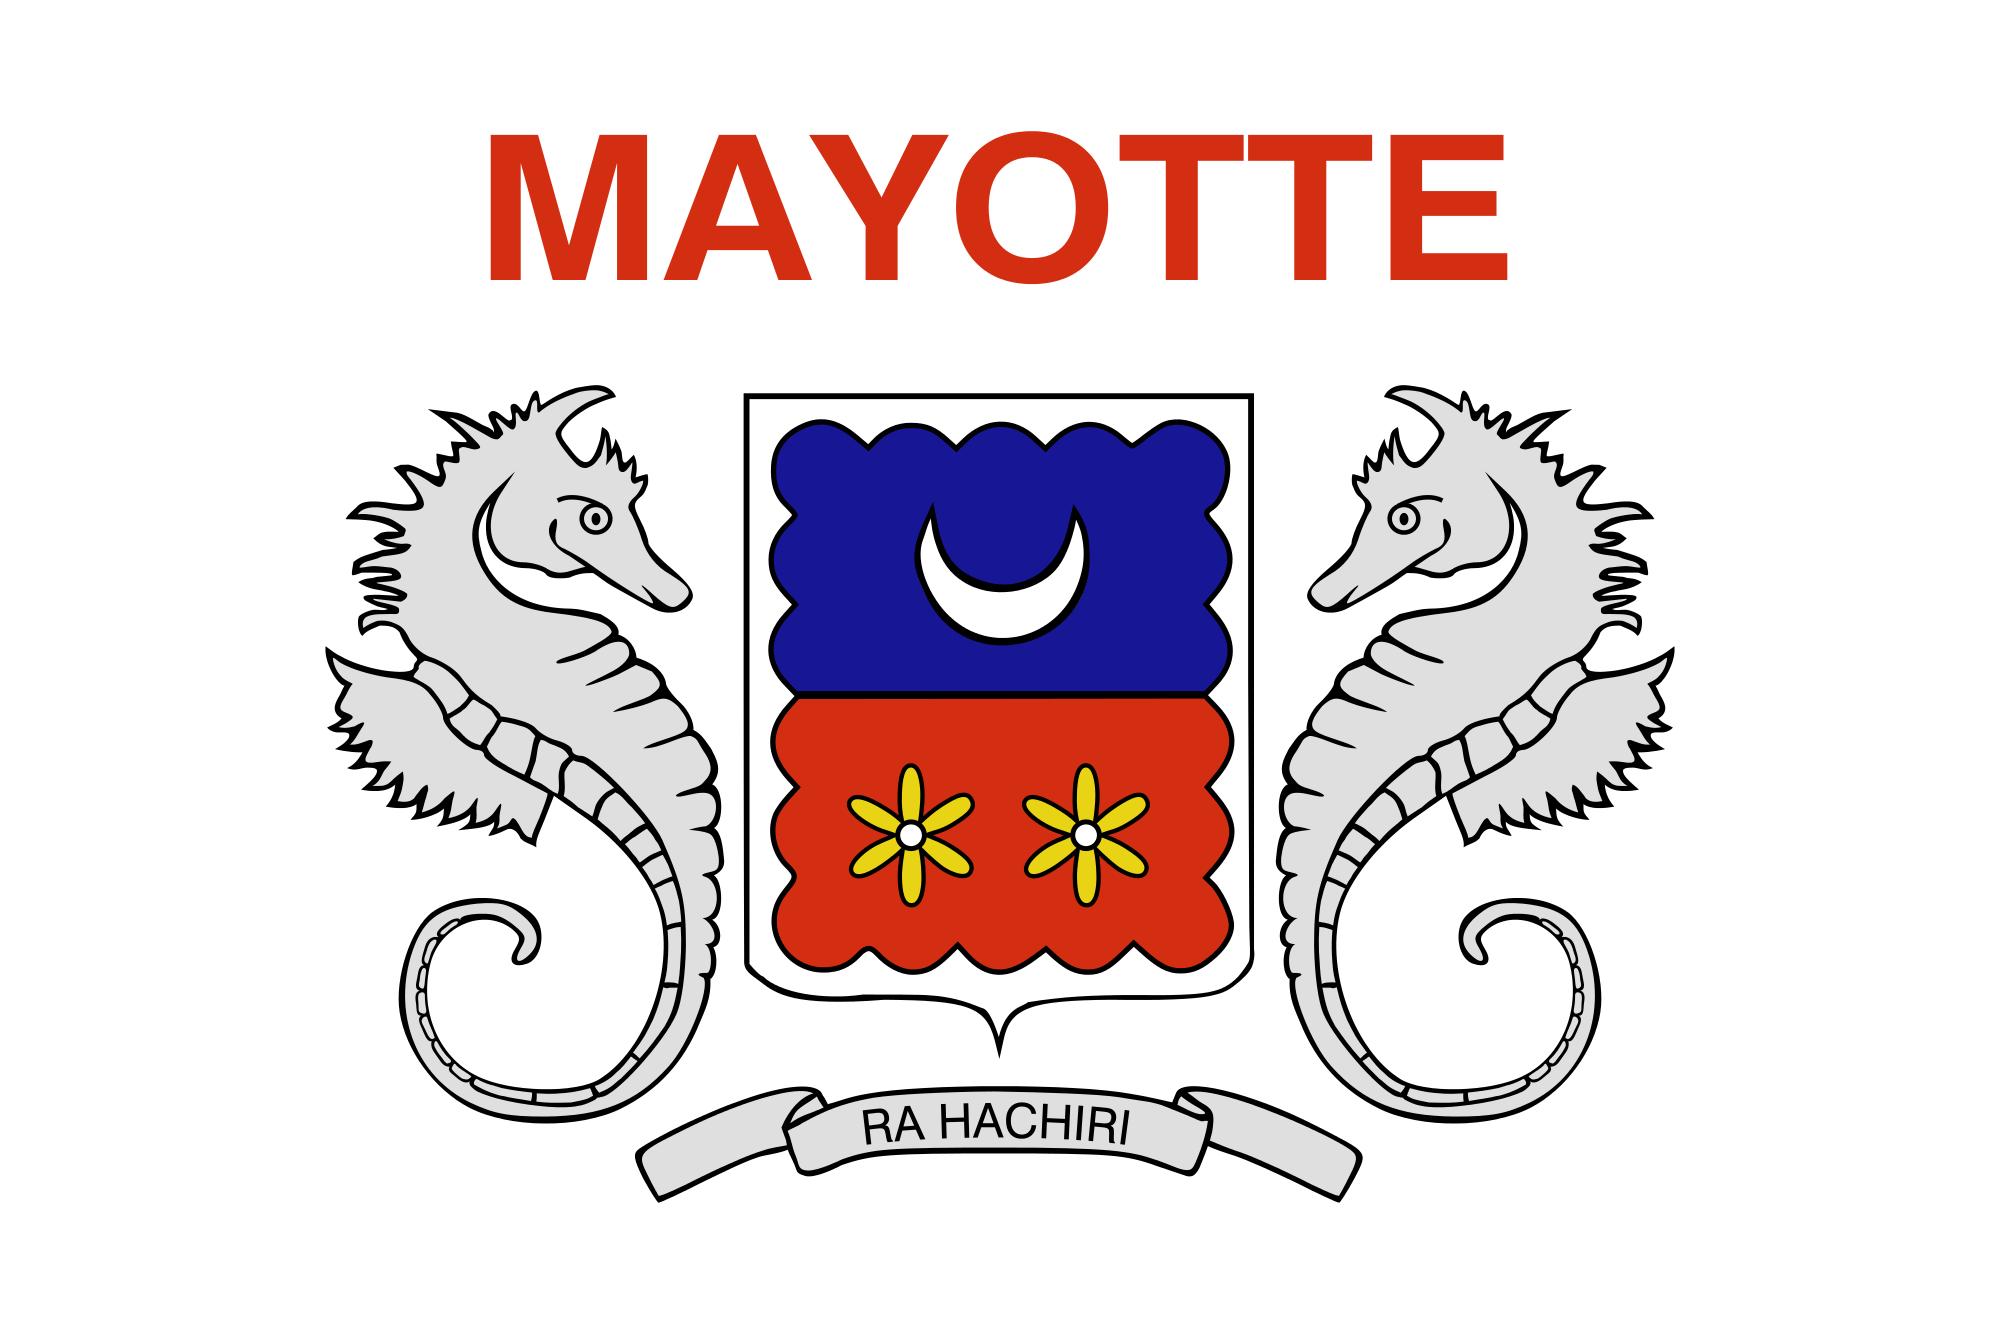 Mayotte, país, Brasão de armas, logotipo, símbolo - Papéis de parede HD - Professor-falken.com